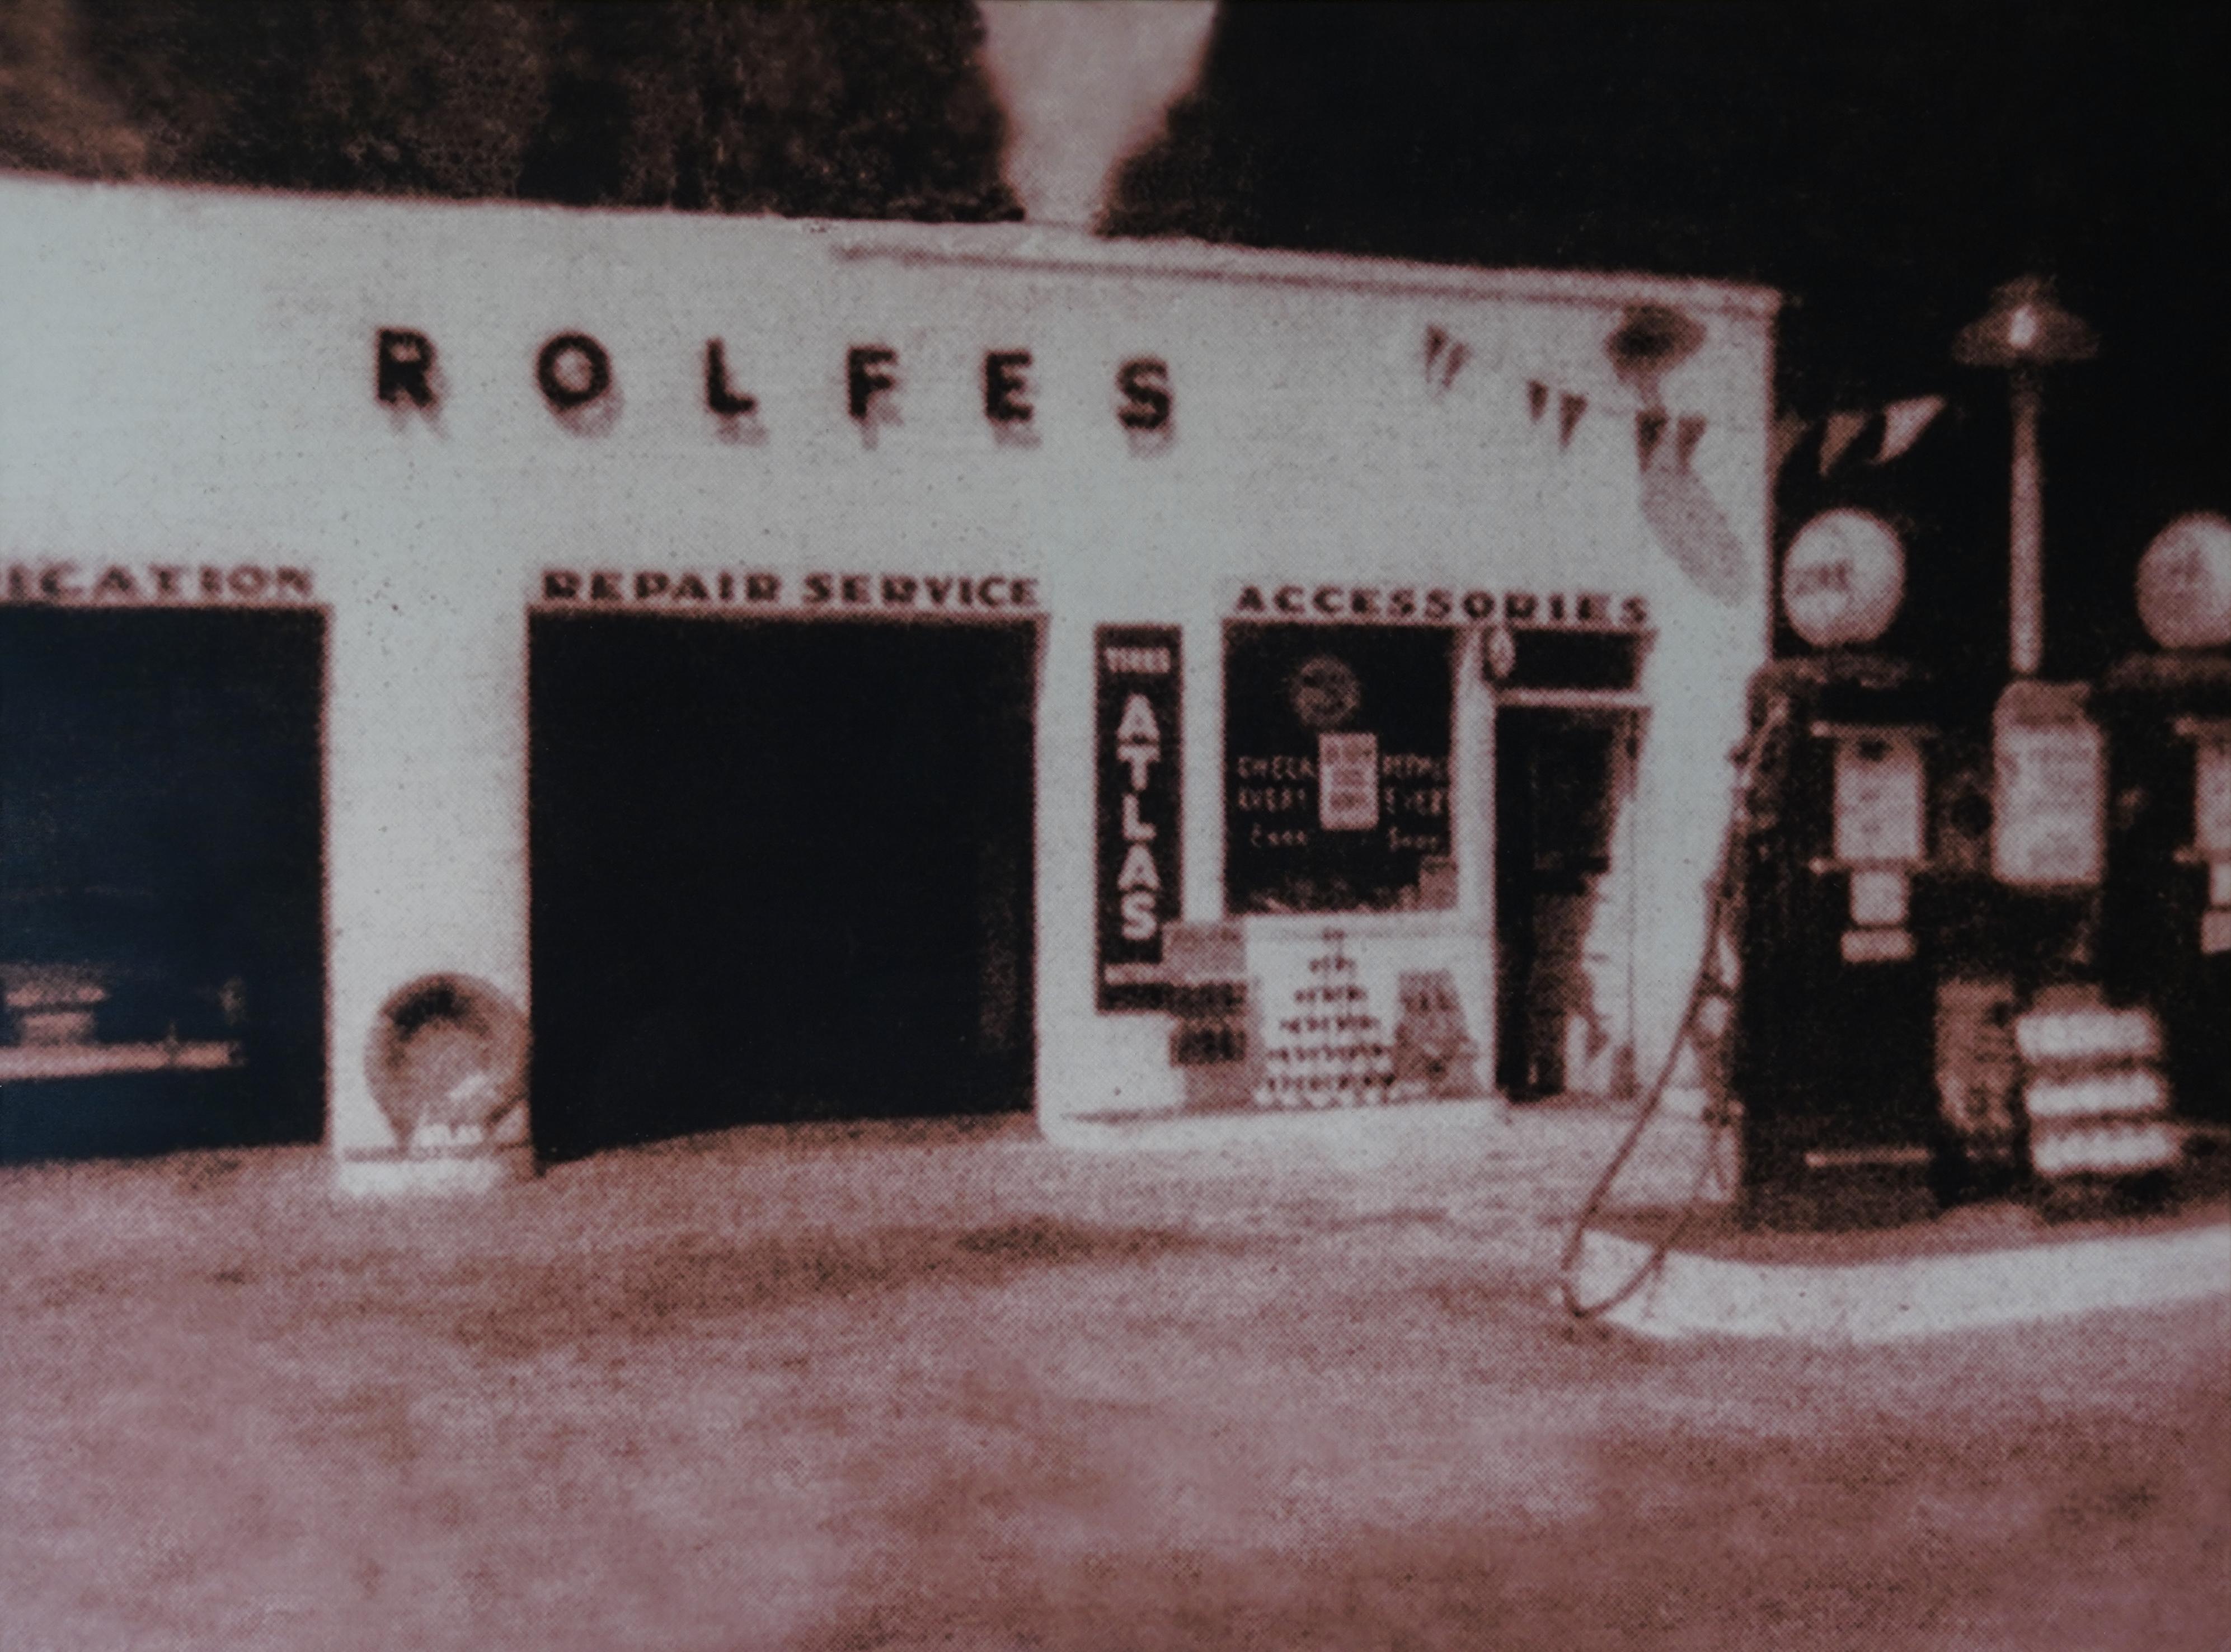 Rolfes Service Station